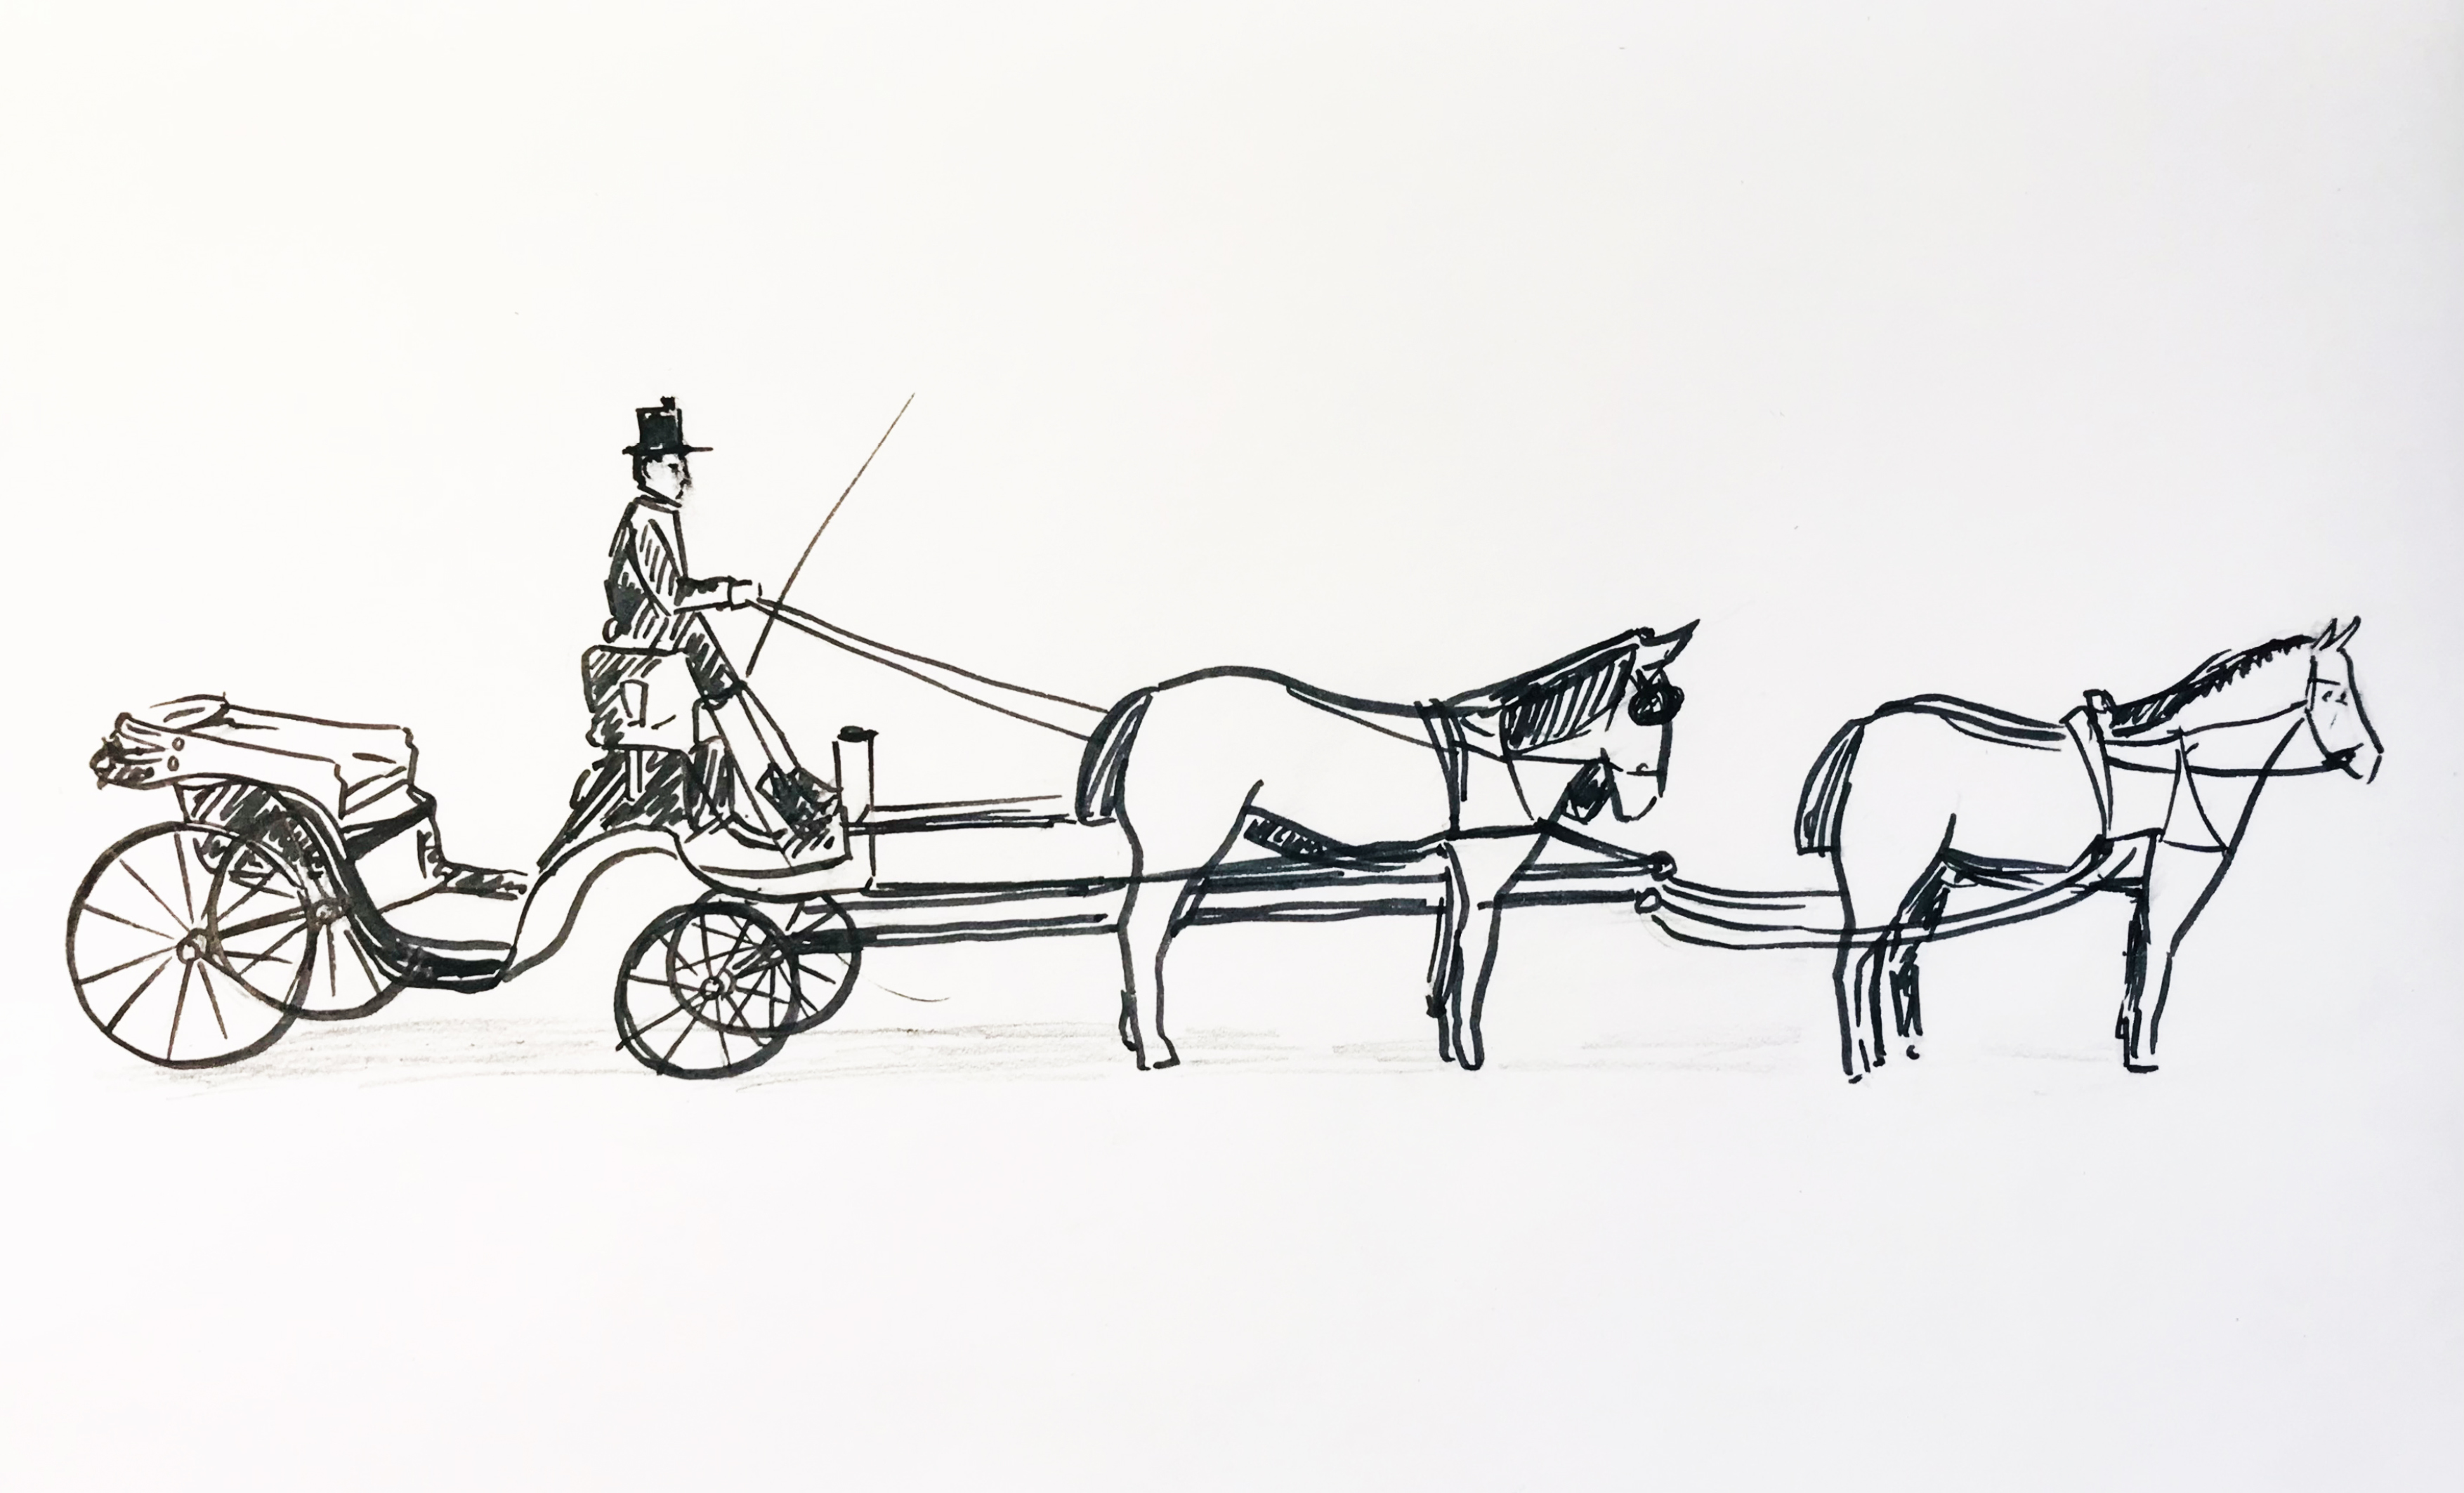 Piirroskuva hevosvaunuista.